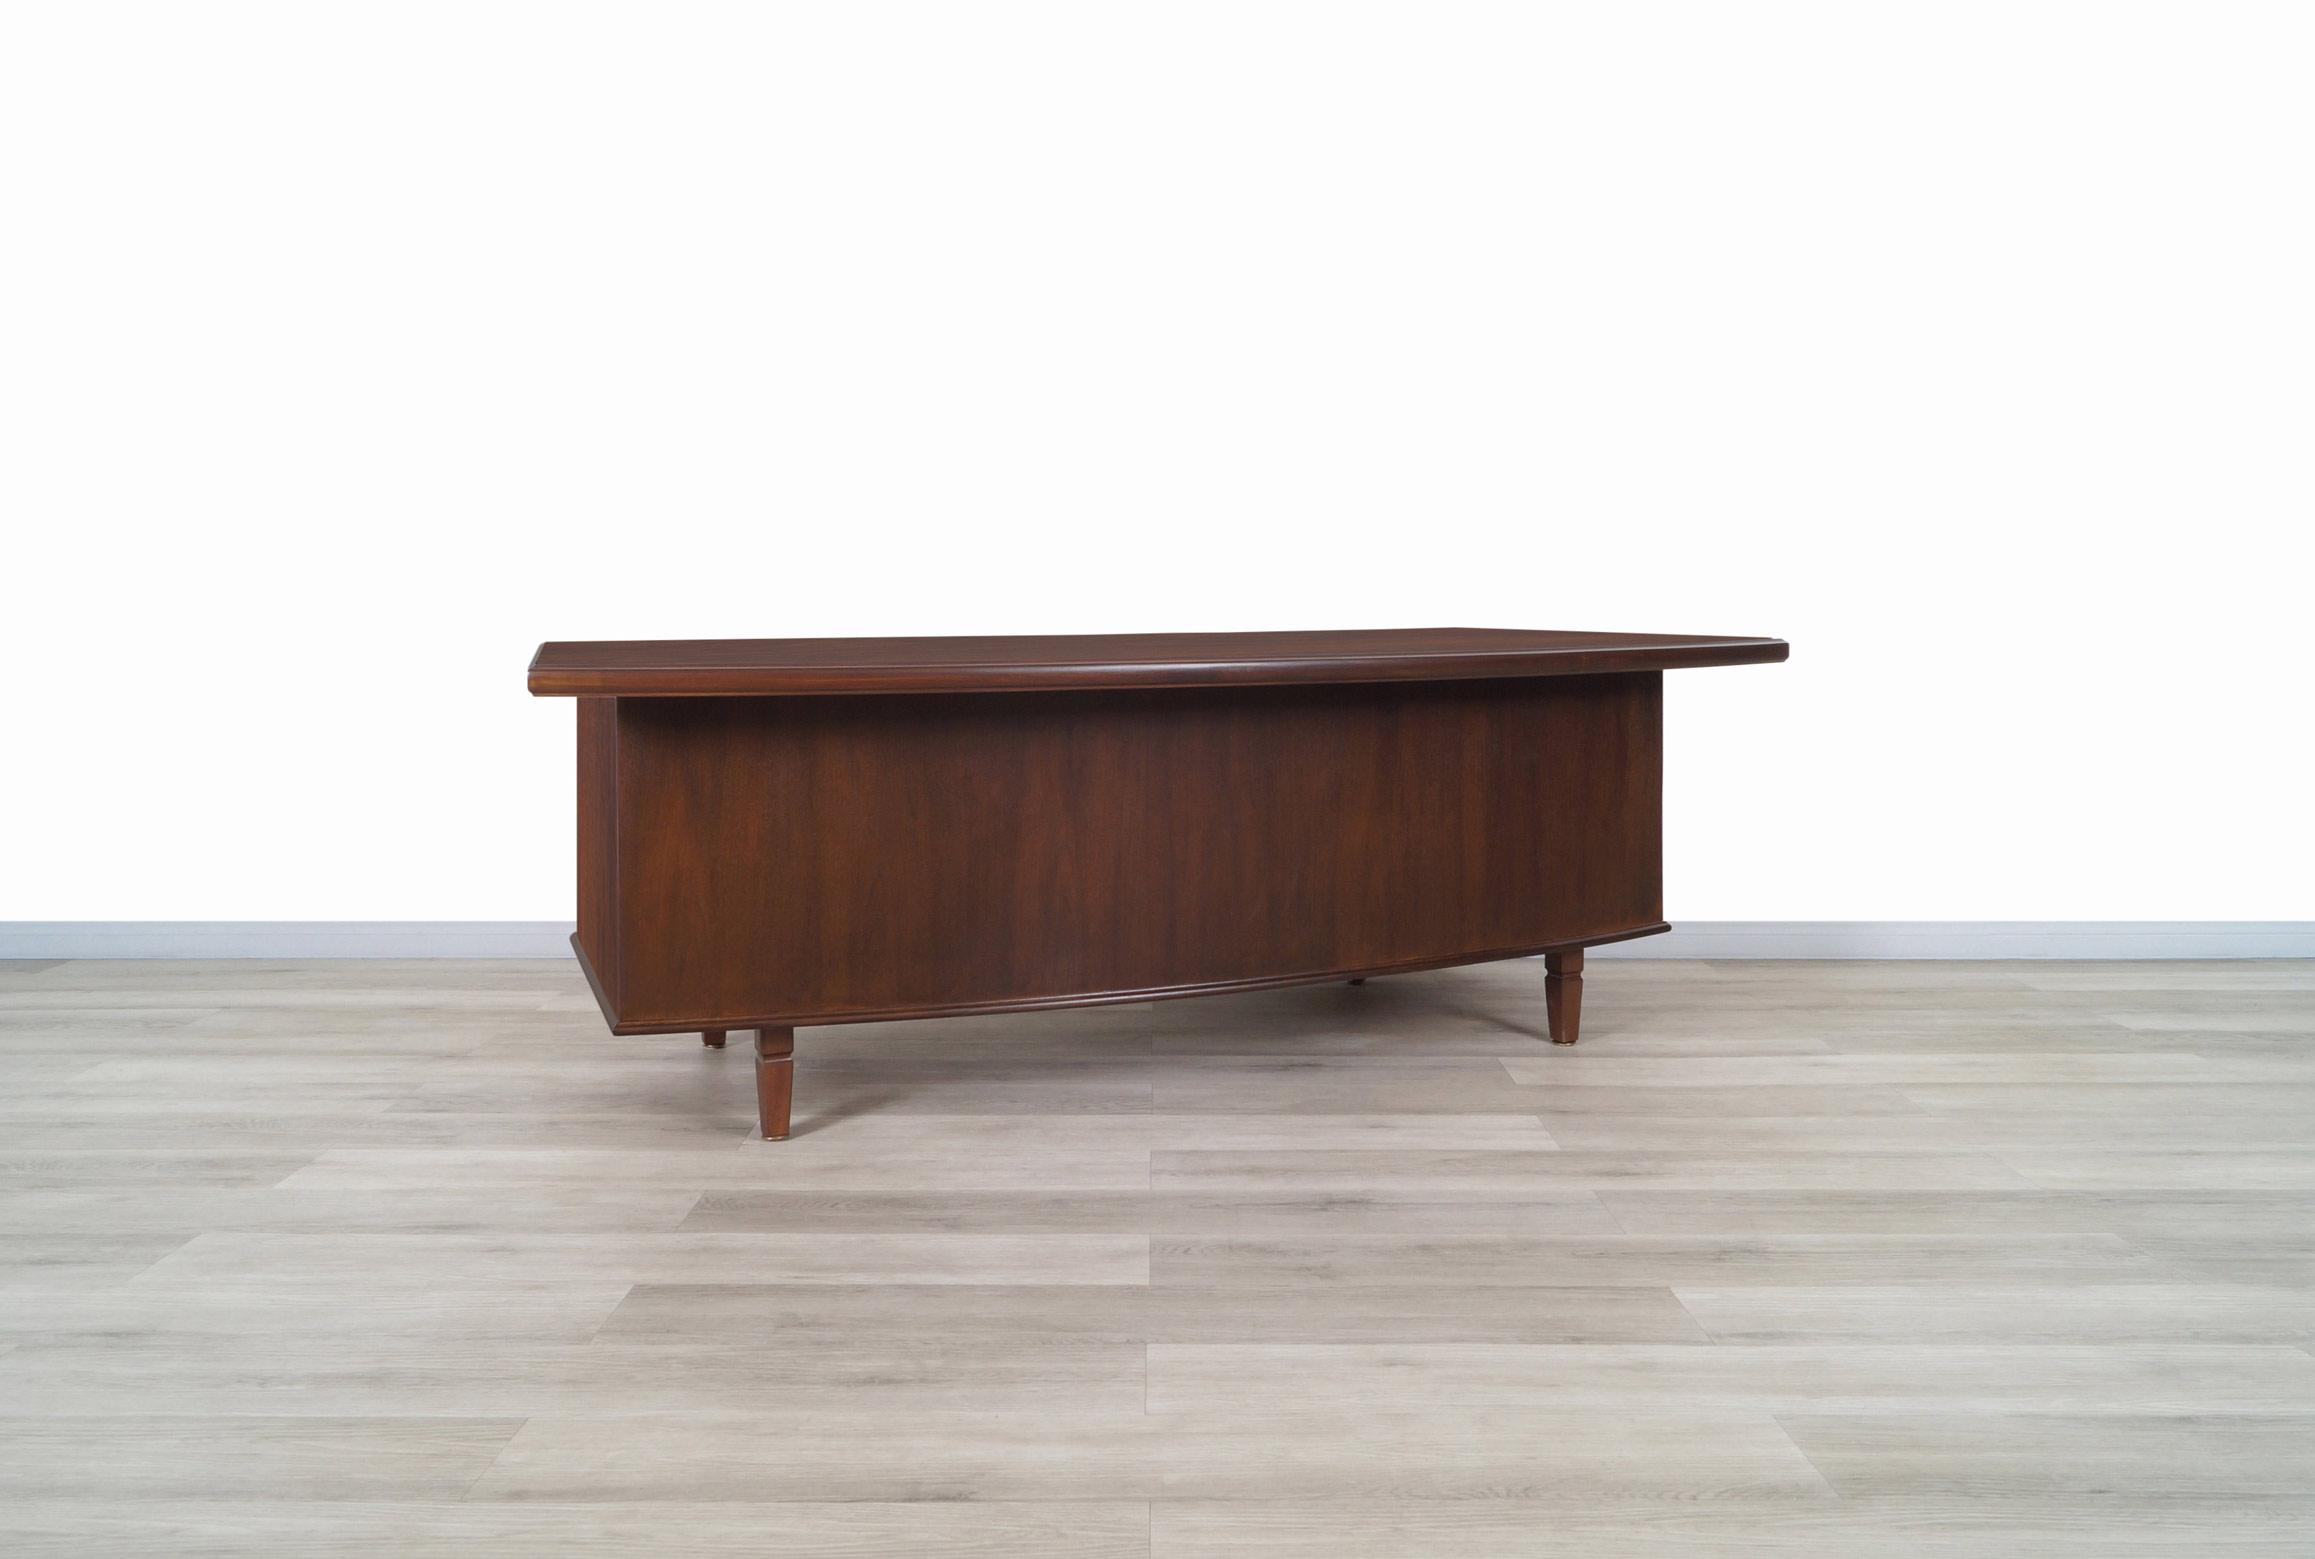 Monumental Executive Walnut Desk by Monteverdi Young